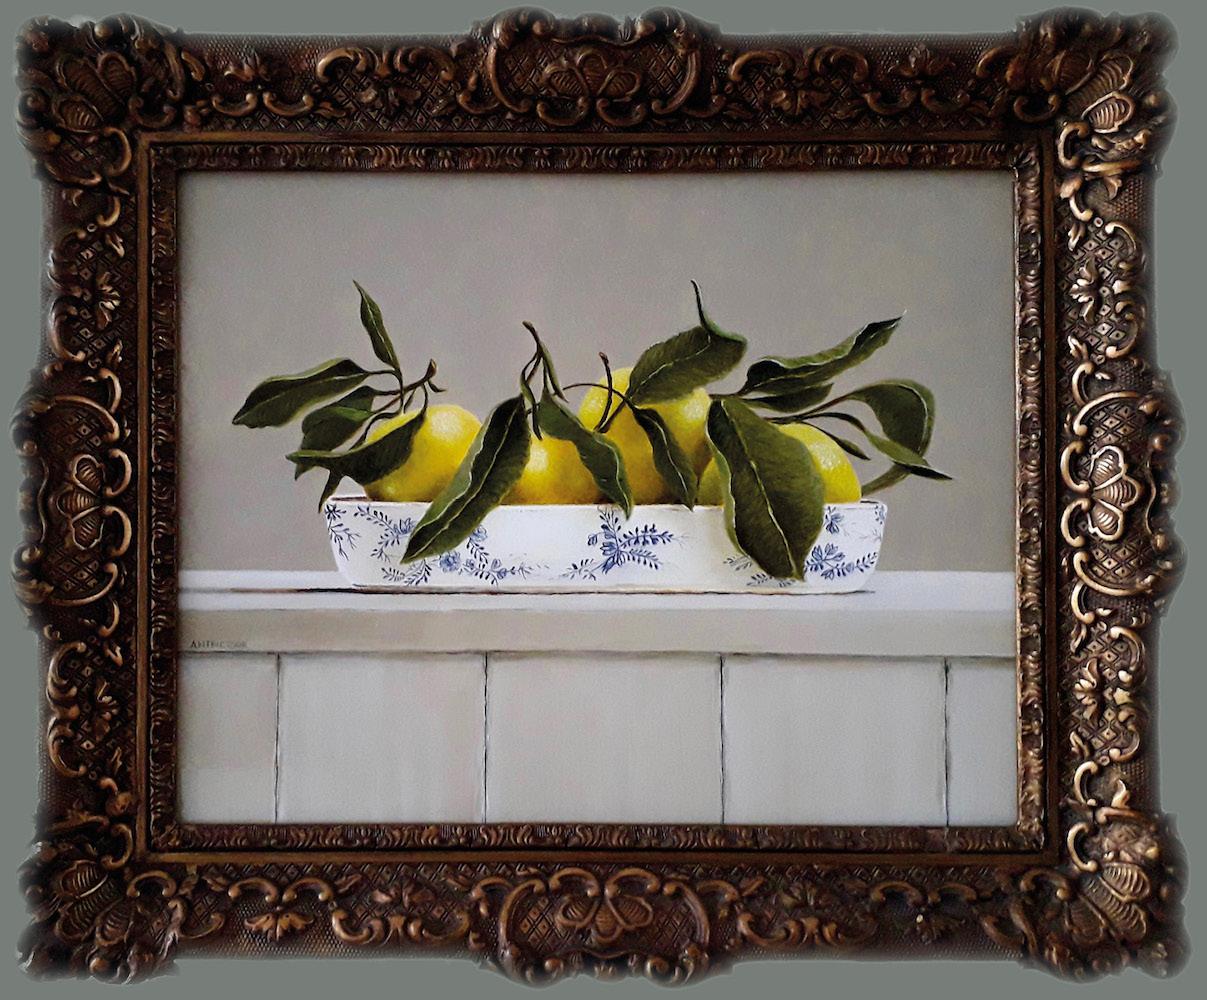 http://www.annemiekefictoor.nl/wp-content/uploads/2019/01/citroenen_in_zeepbakje.jpg